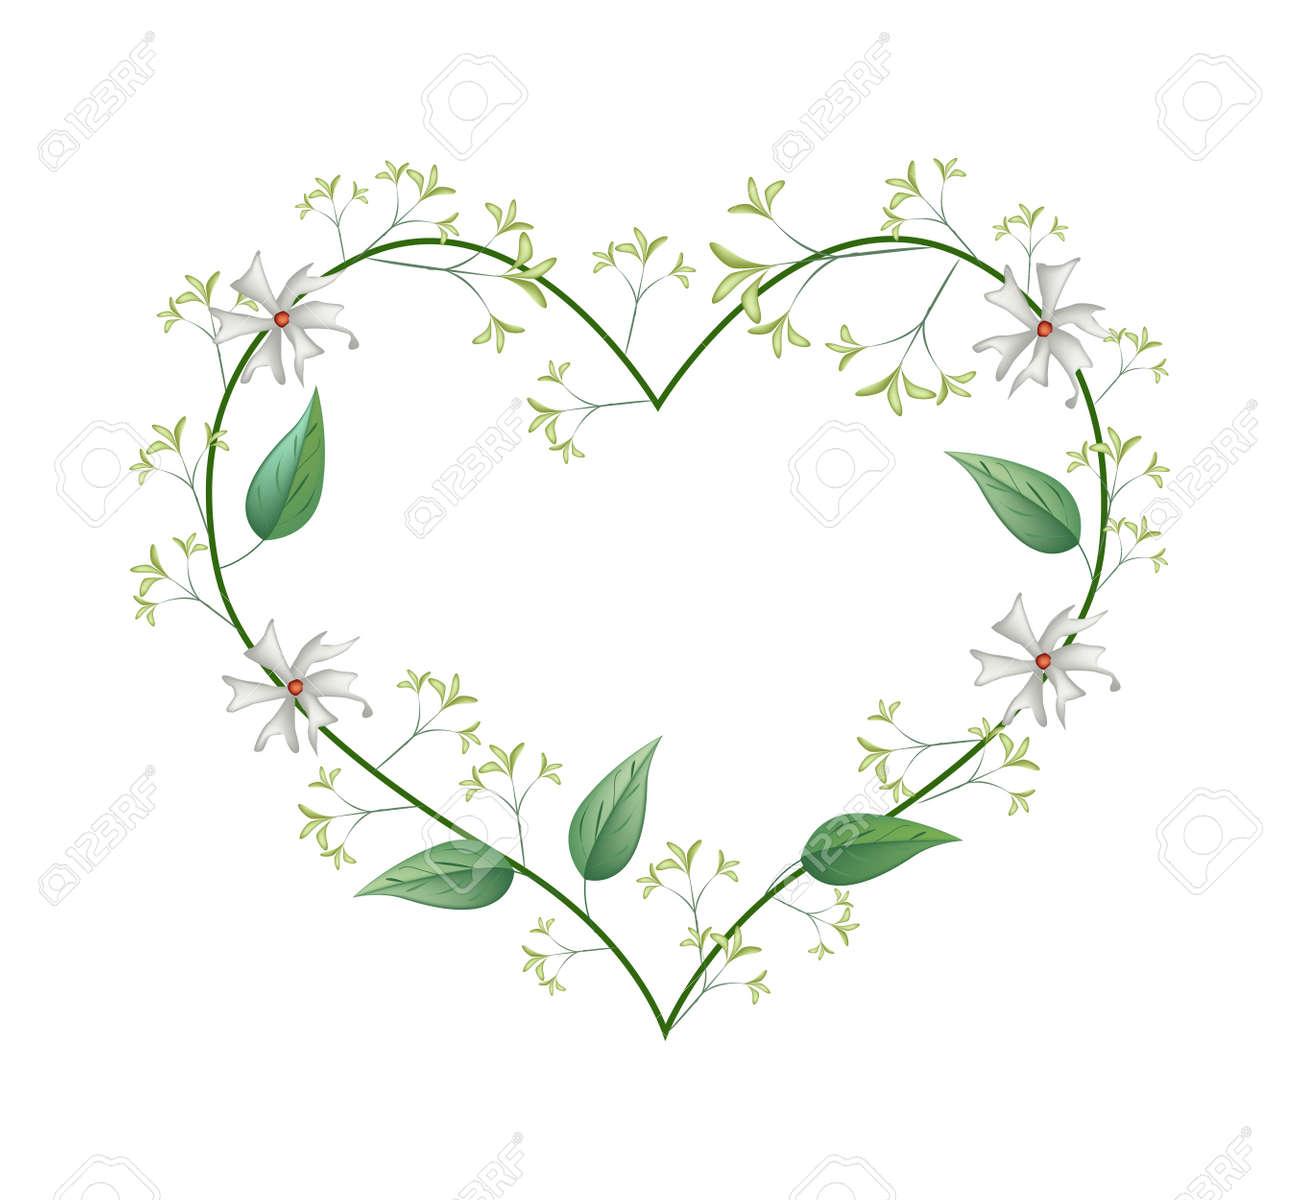 Love Concept Illustration Of White Tuberose Flowers Or Night